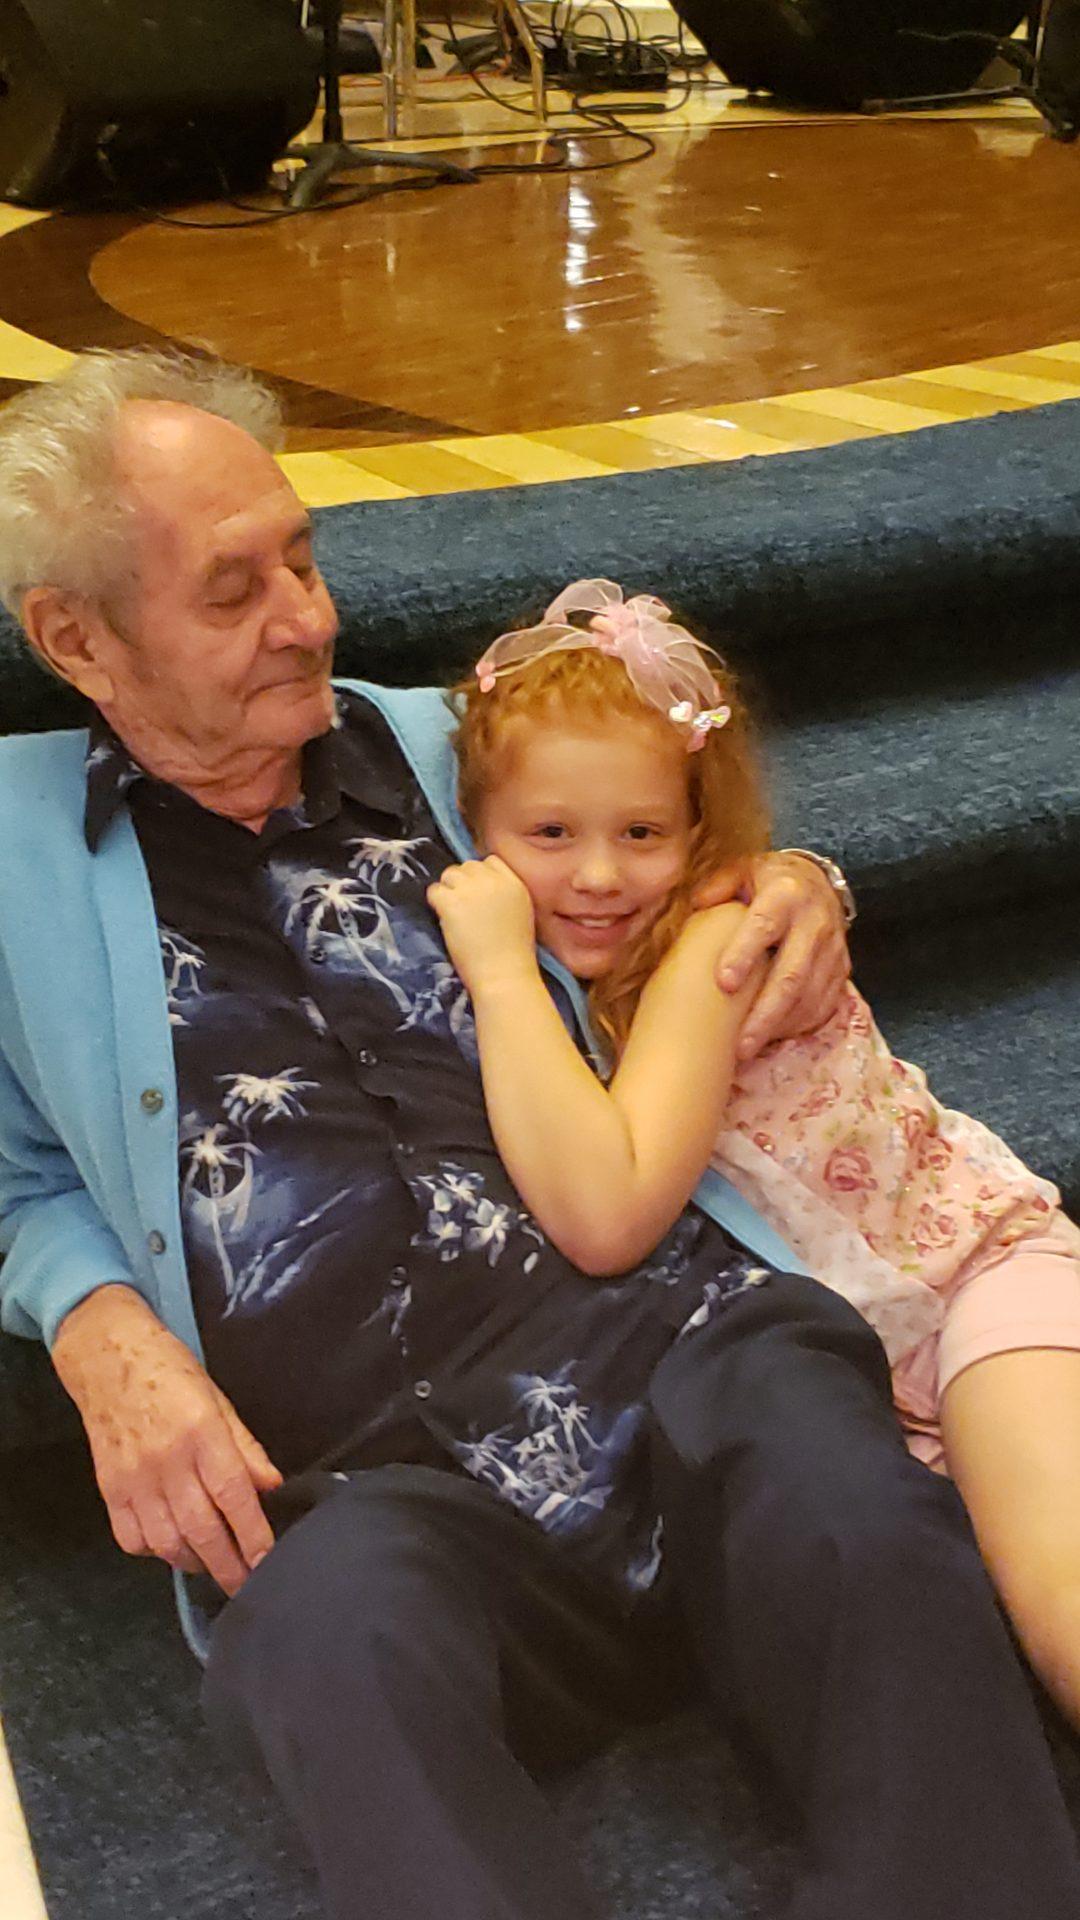 Brianna loved grandpa!